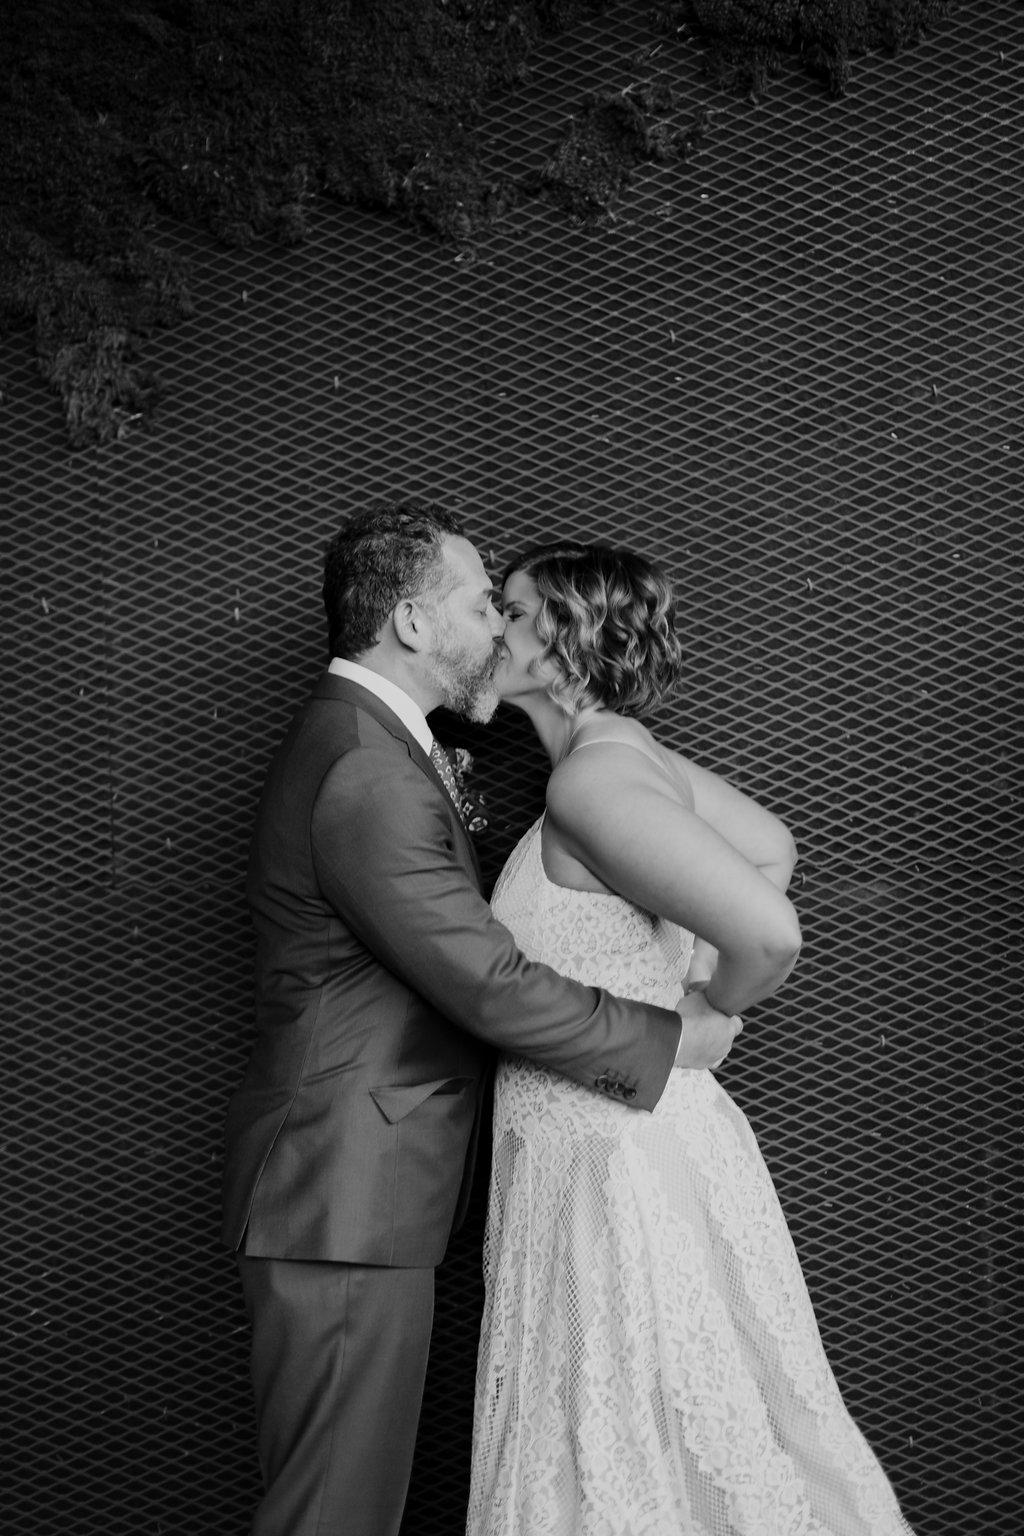 Paige-Newton-Intimate-Wedding-Photographer-Malverde-Wedding-Photography0055.jpg